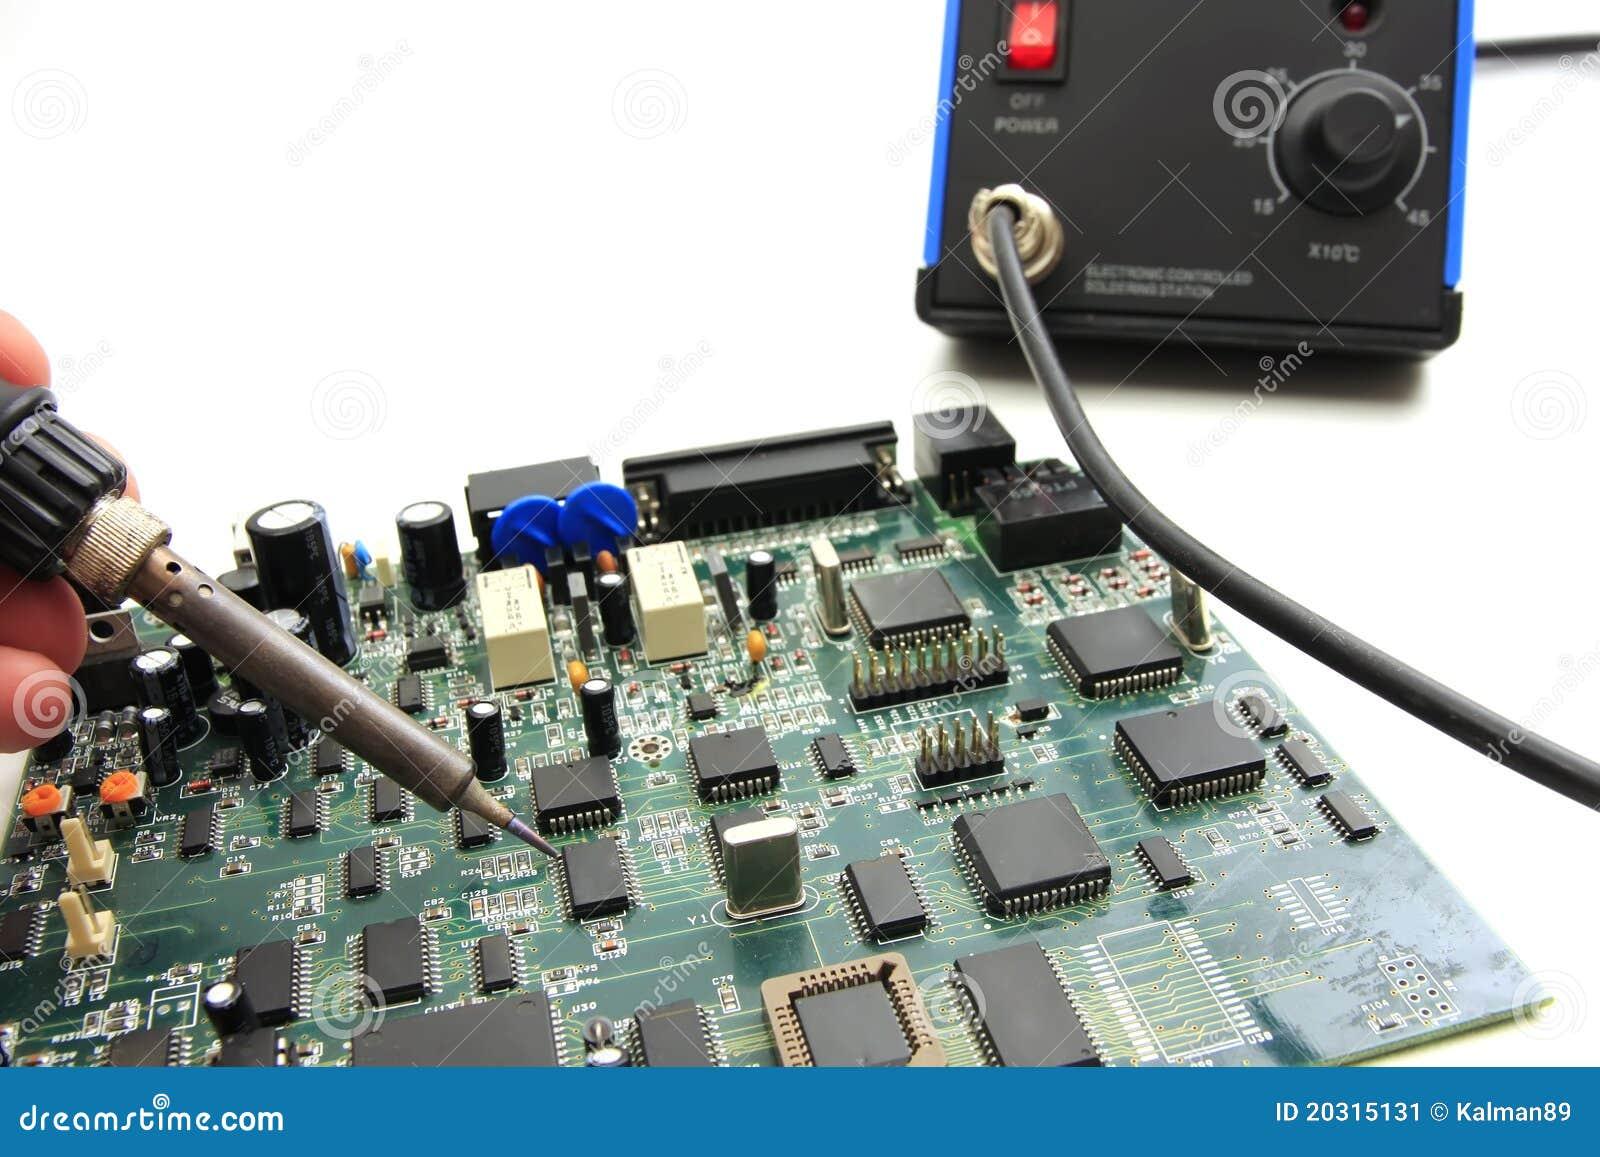 soldering circuit board stock image image 20315131. Black Bedroom Furniture Sets. Home Design Ideas